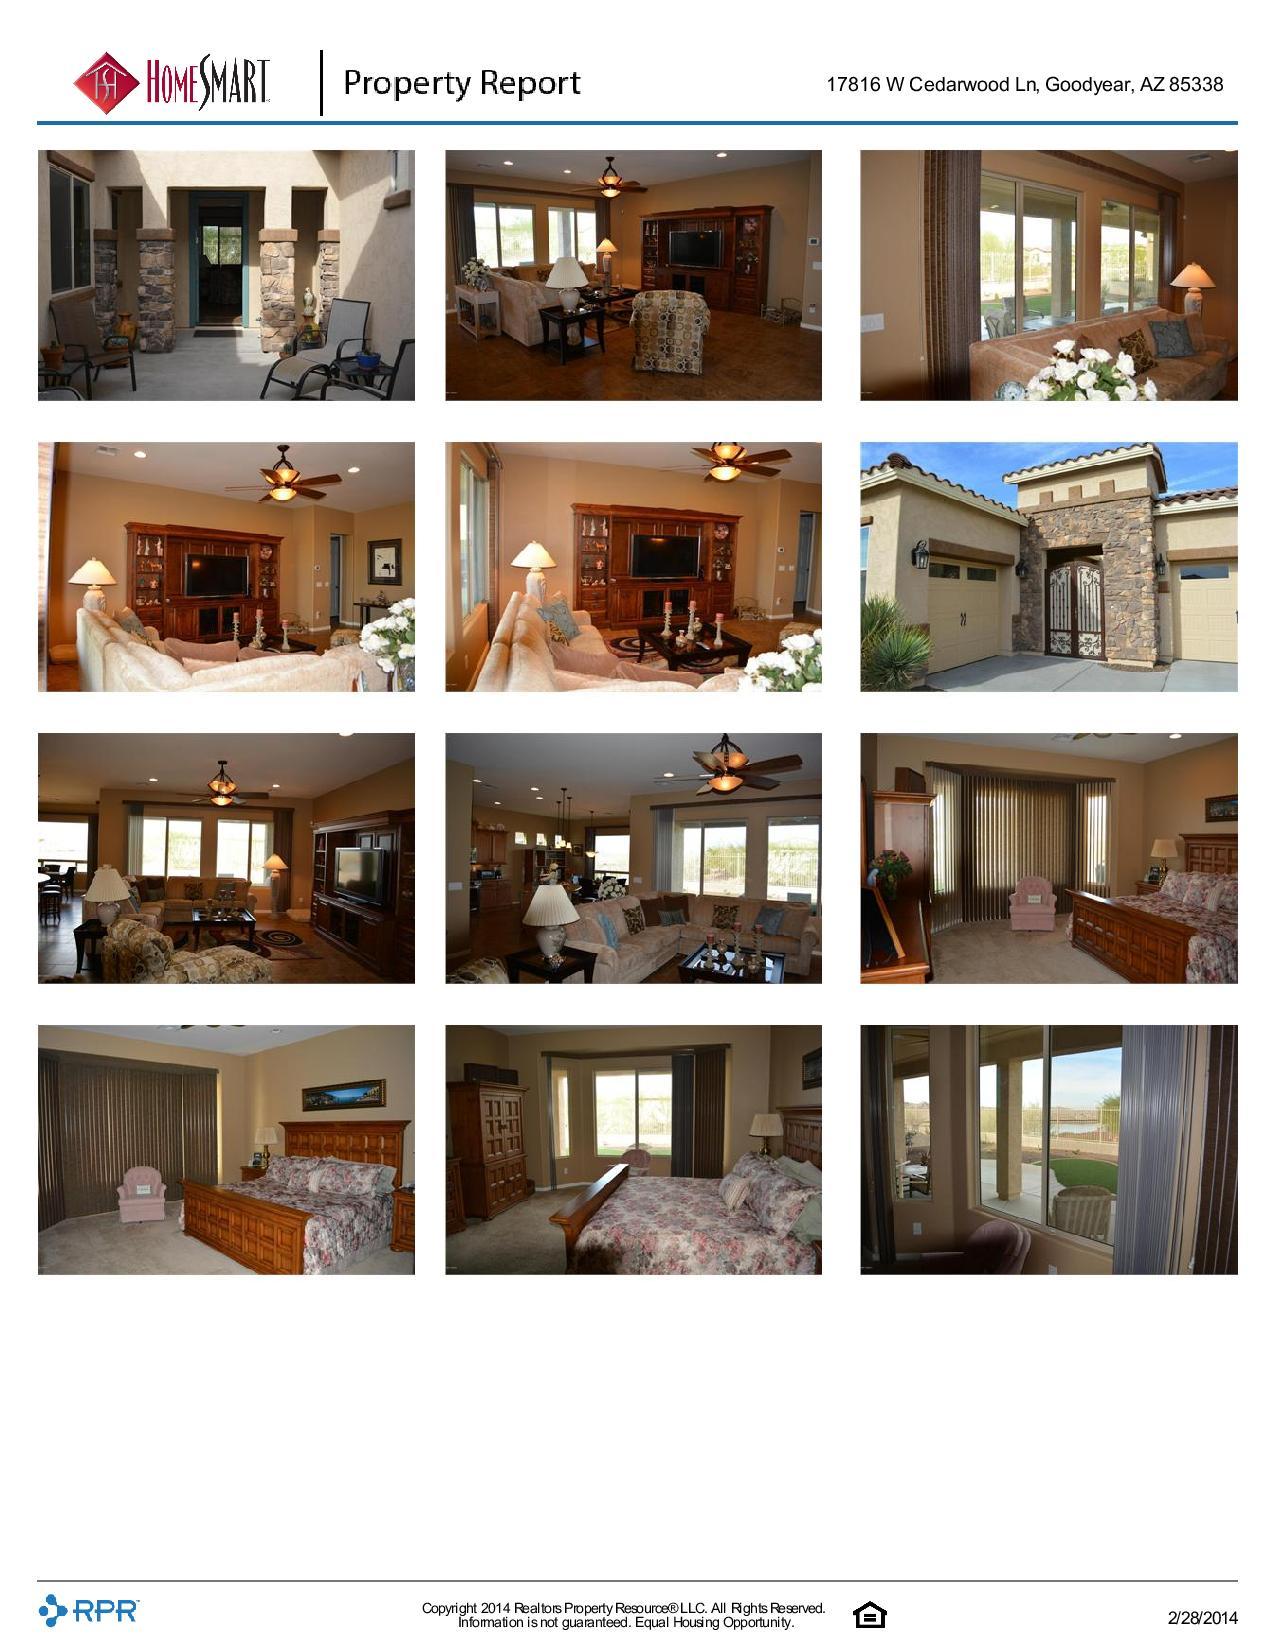 17816-W-Cedarwood-Ln-Goodyear-AZ-85338-page-008